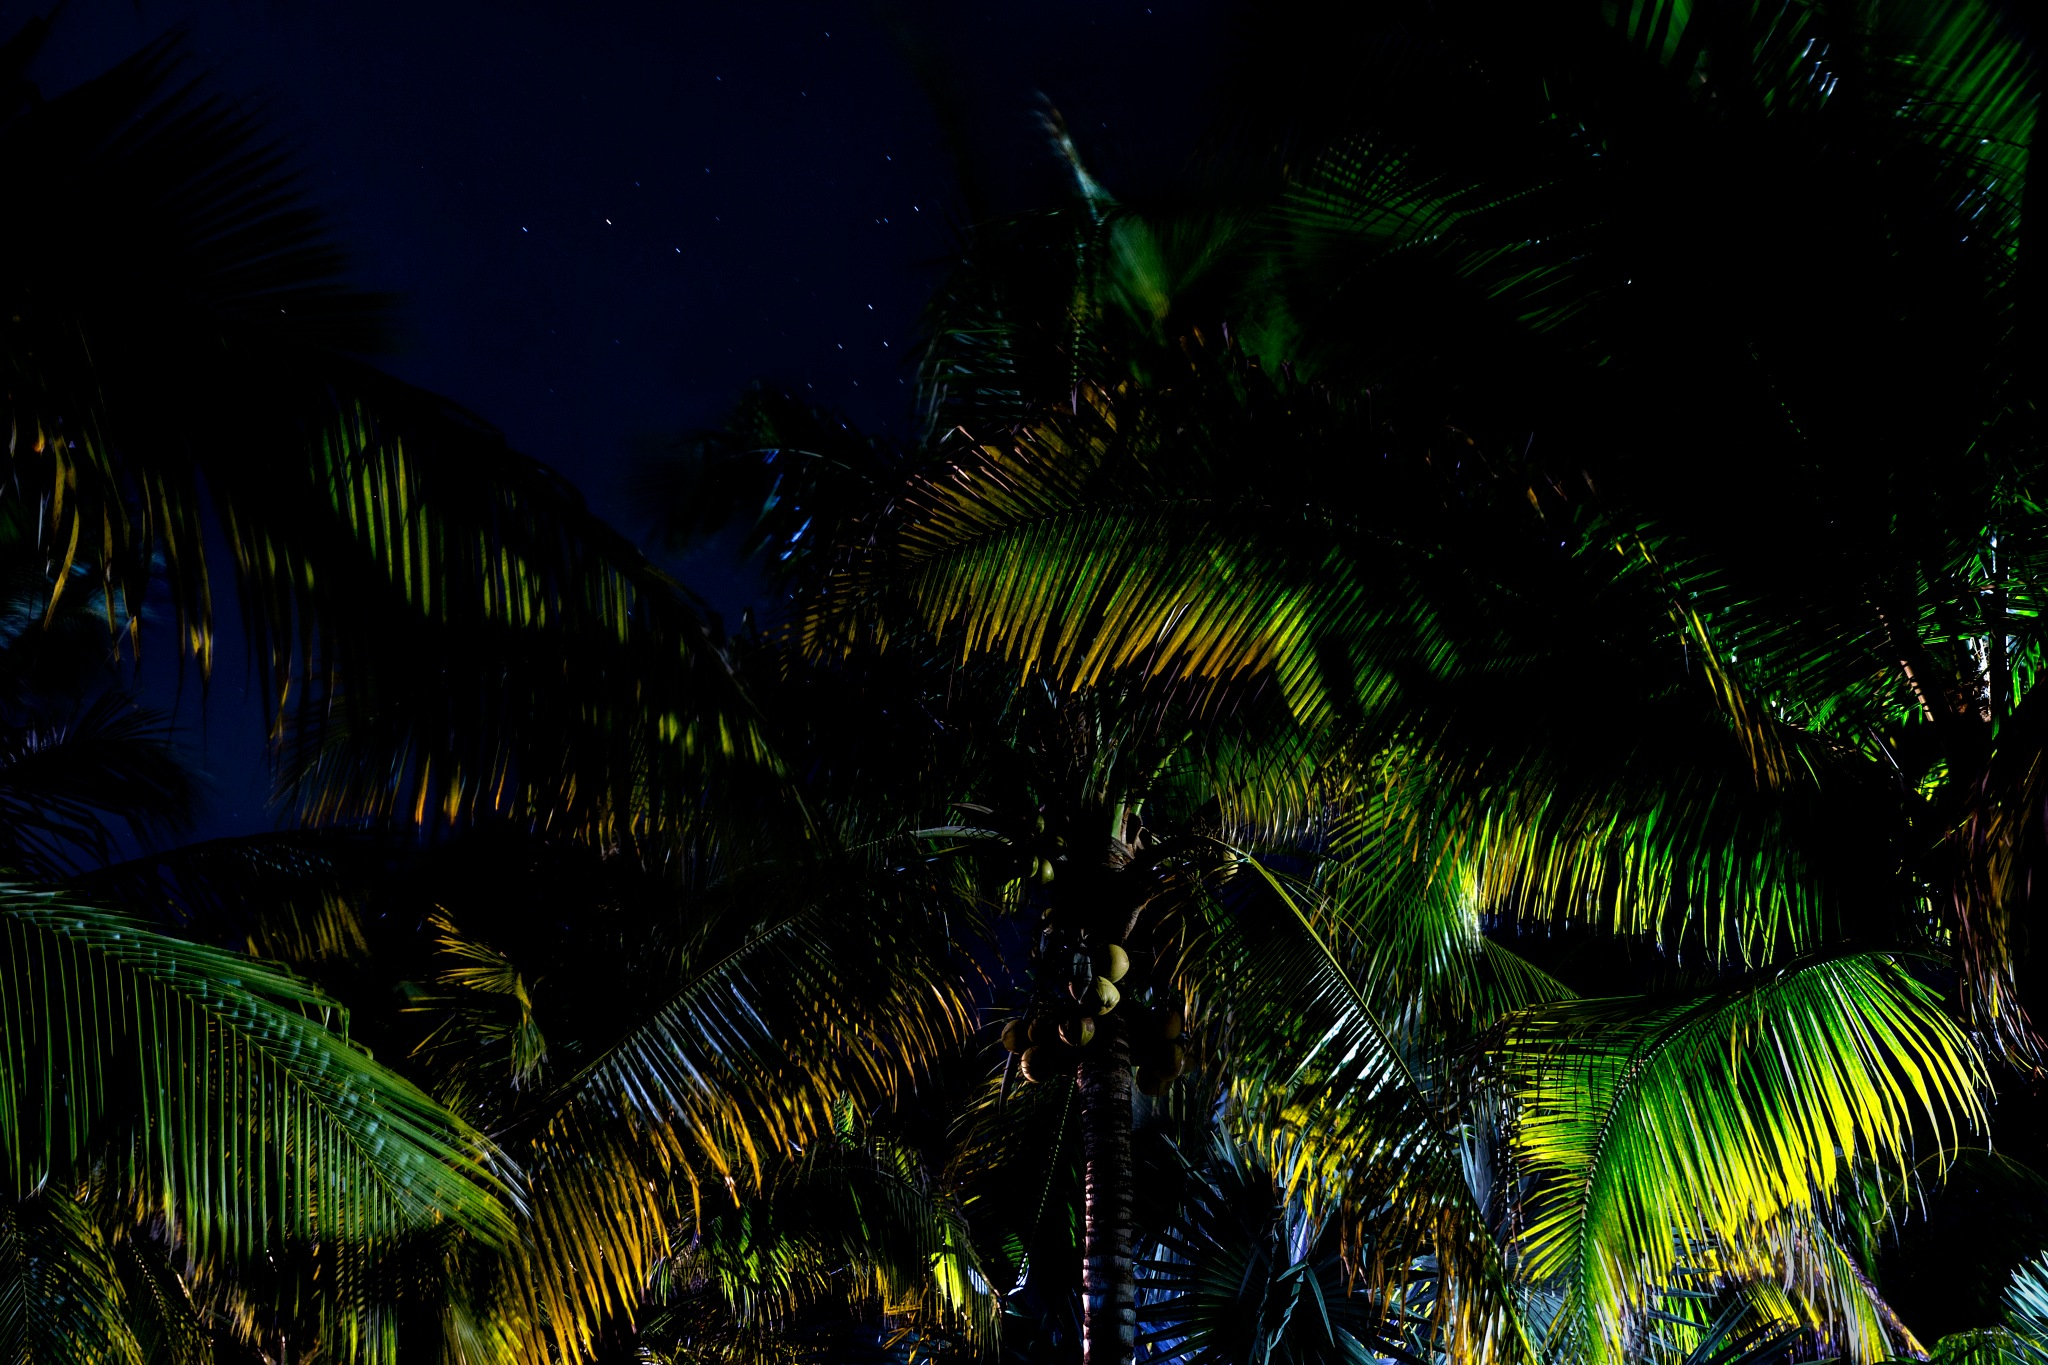 happy night by edgarramosfotografia